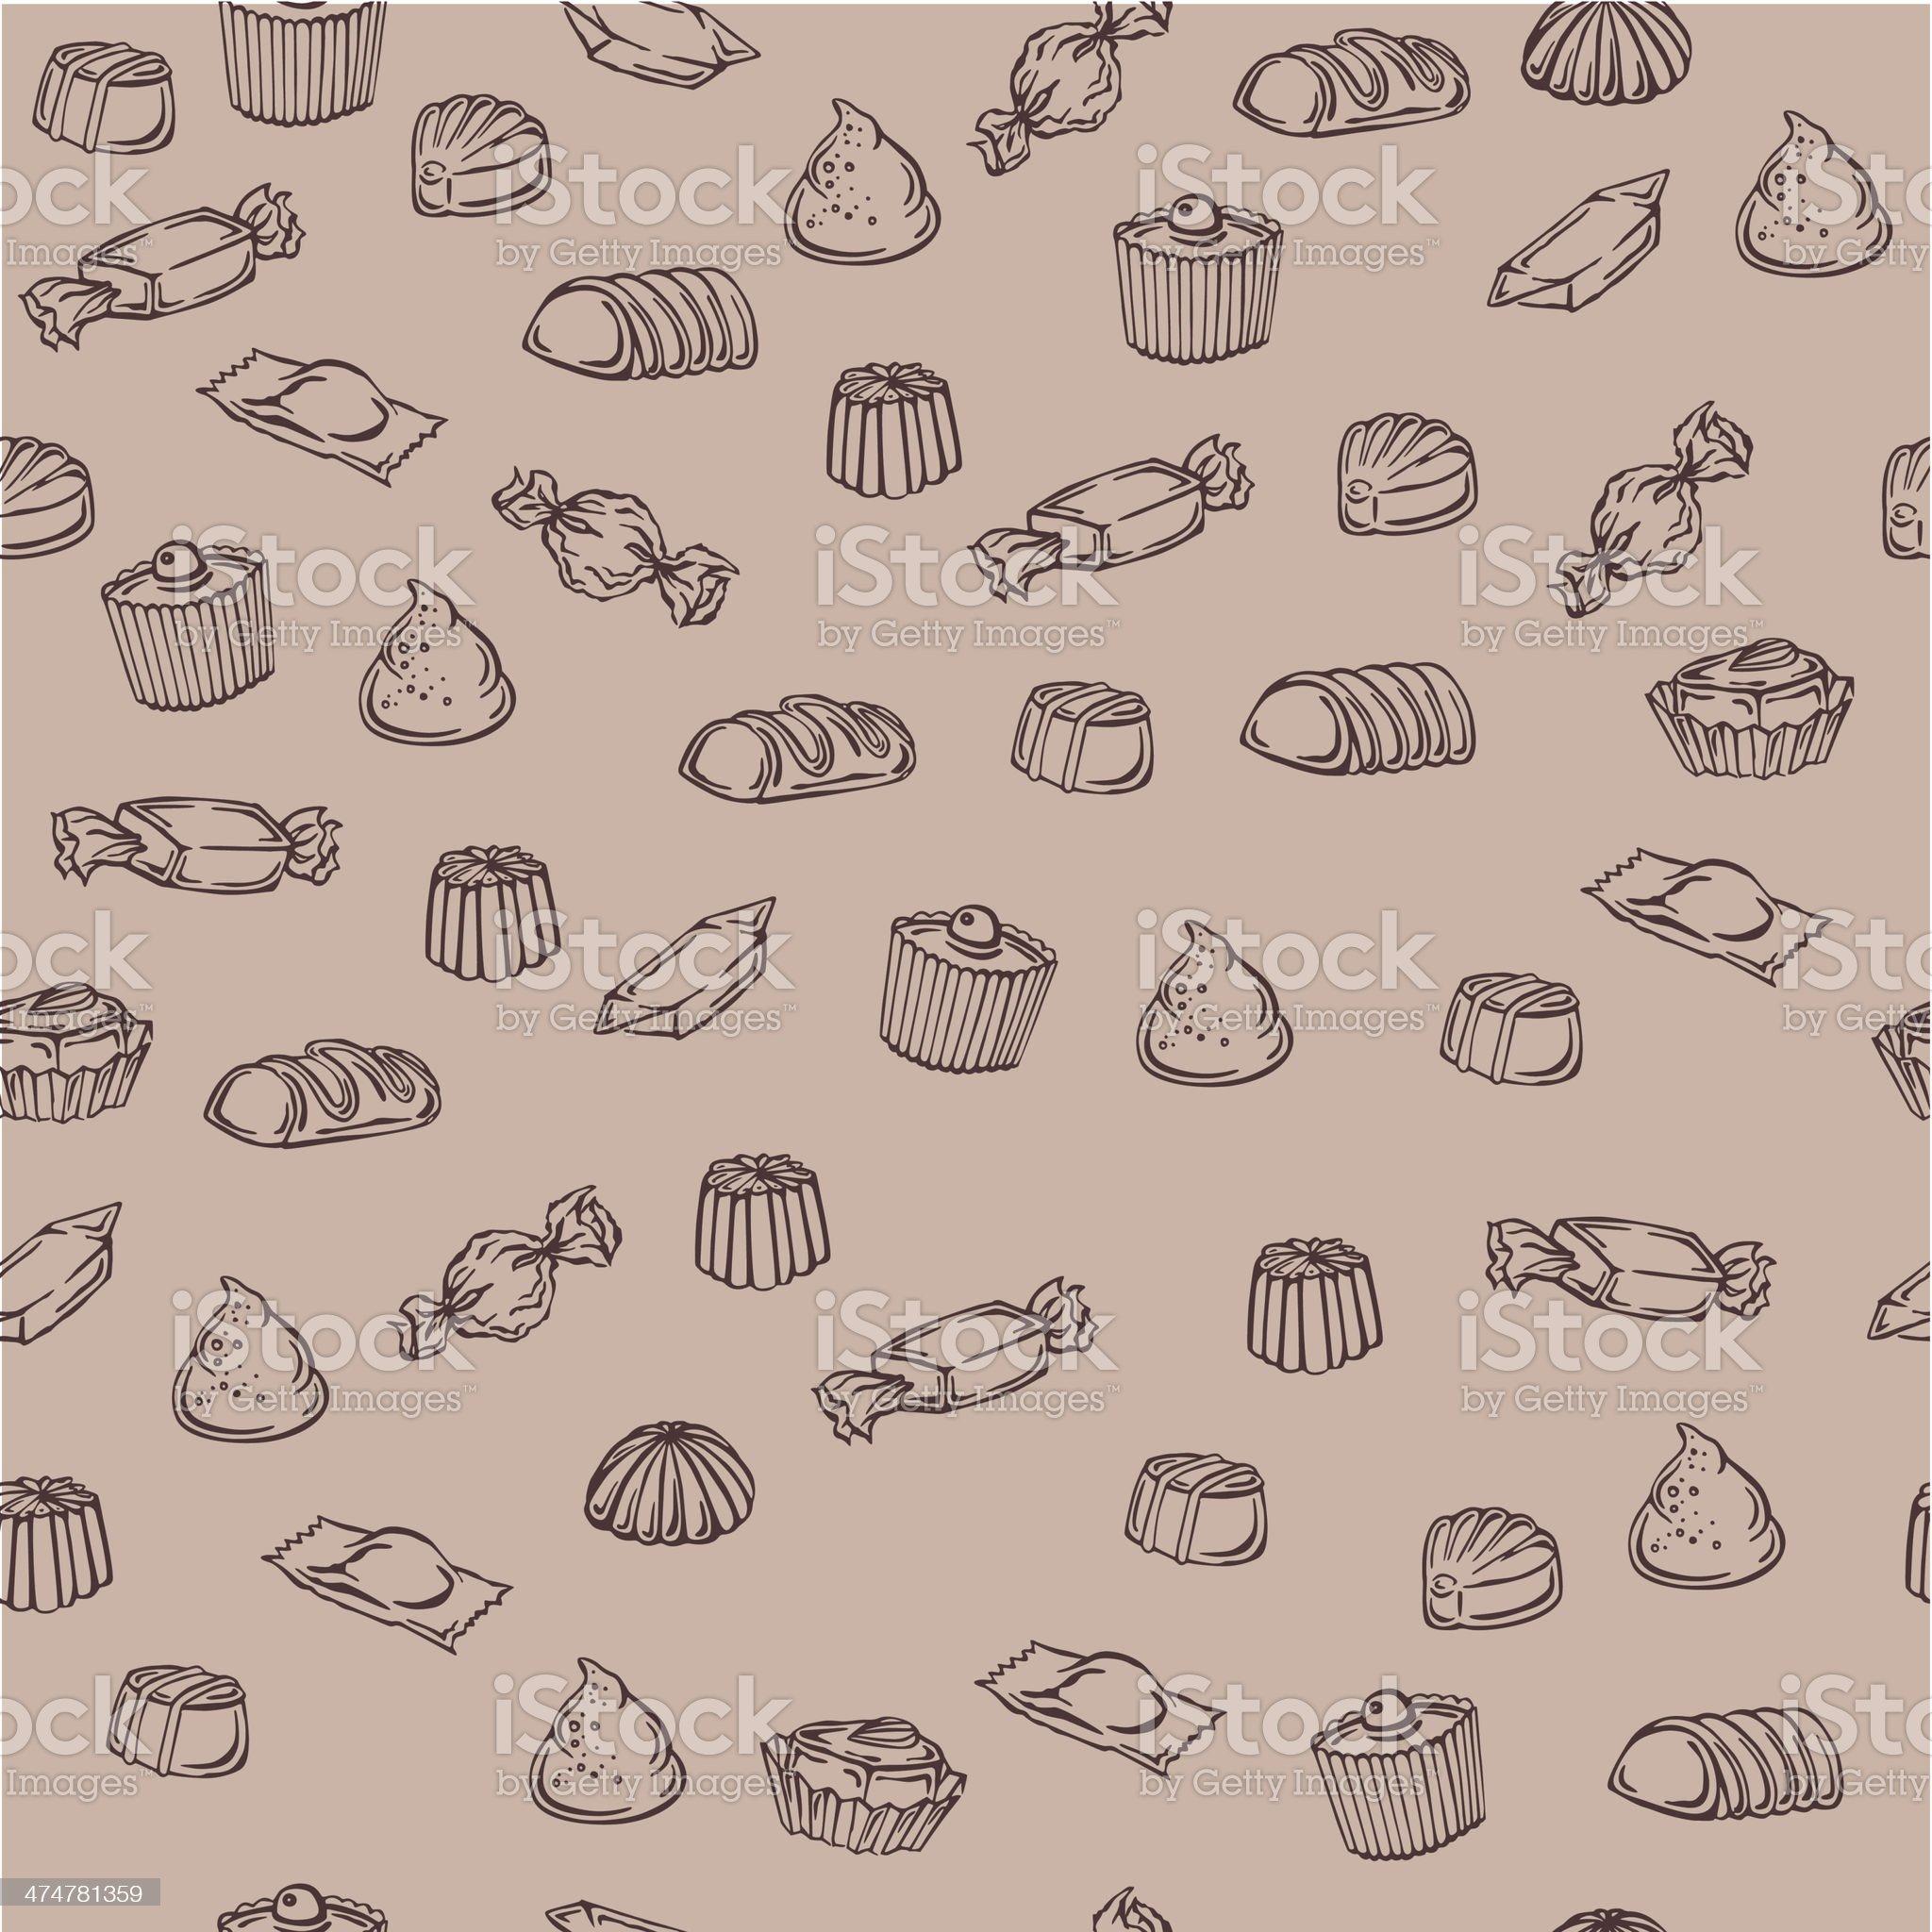 pattern of chocolates royalty-free stock vector art